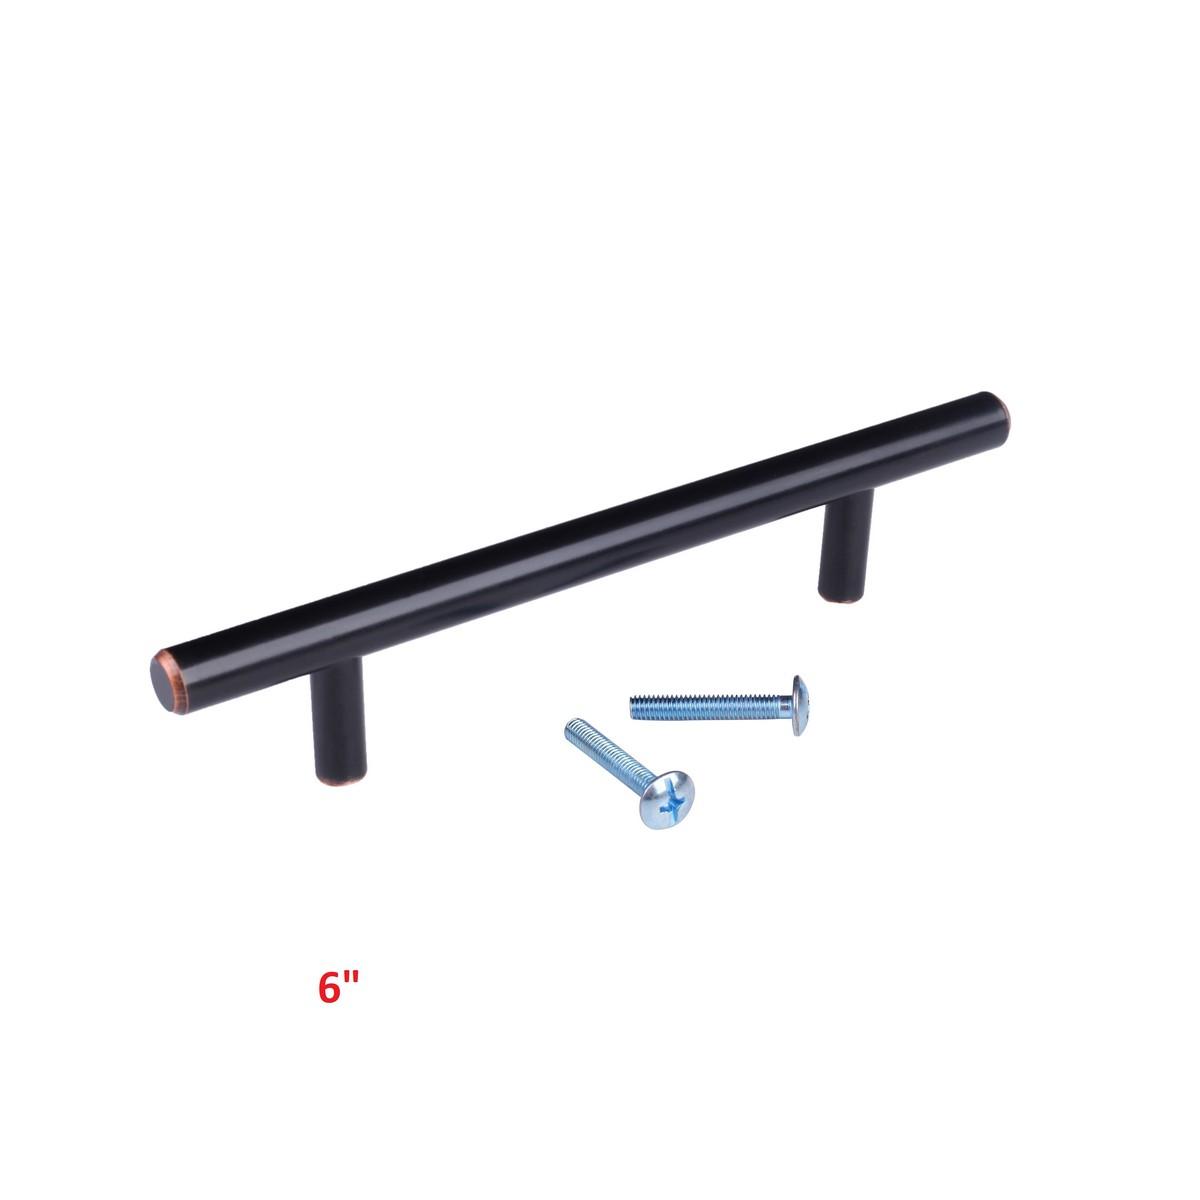 Oil-Rubbed-Bronze-T-Bar-Kitchen-Cabinet-Door-Hardware-Pulls-Handles-Knobs-Knob